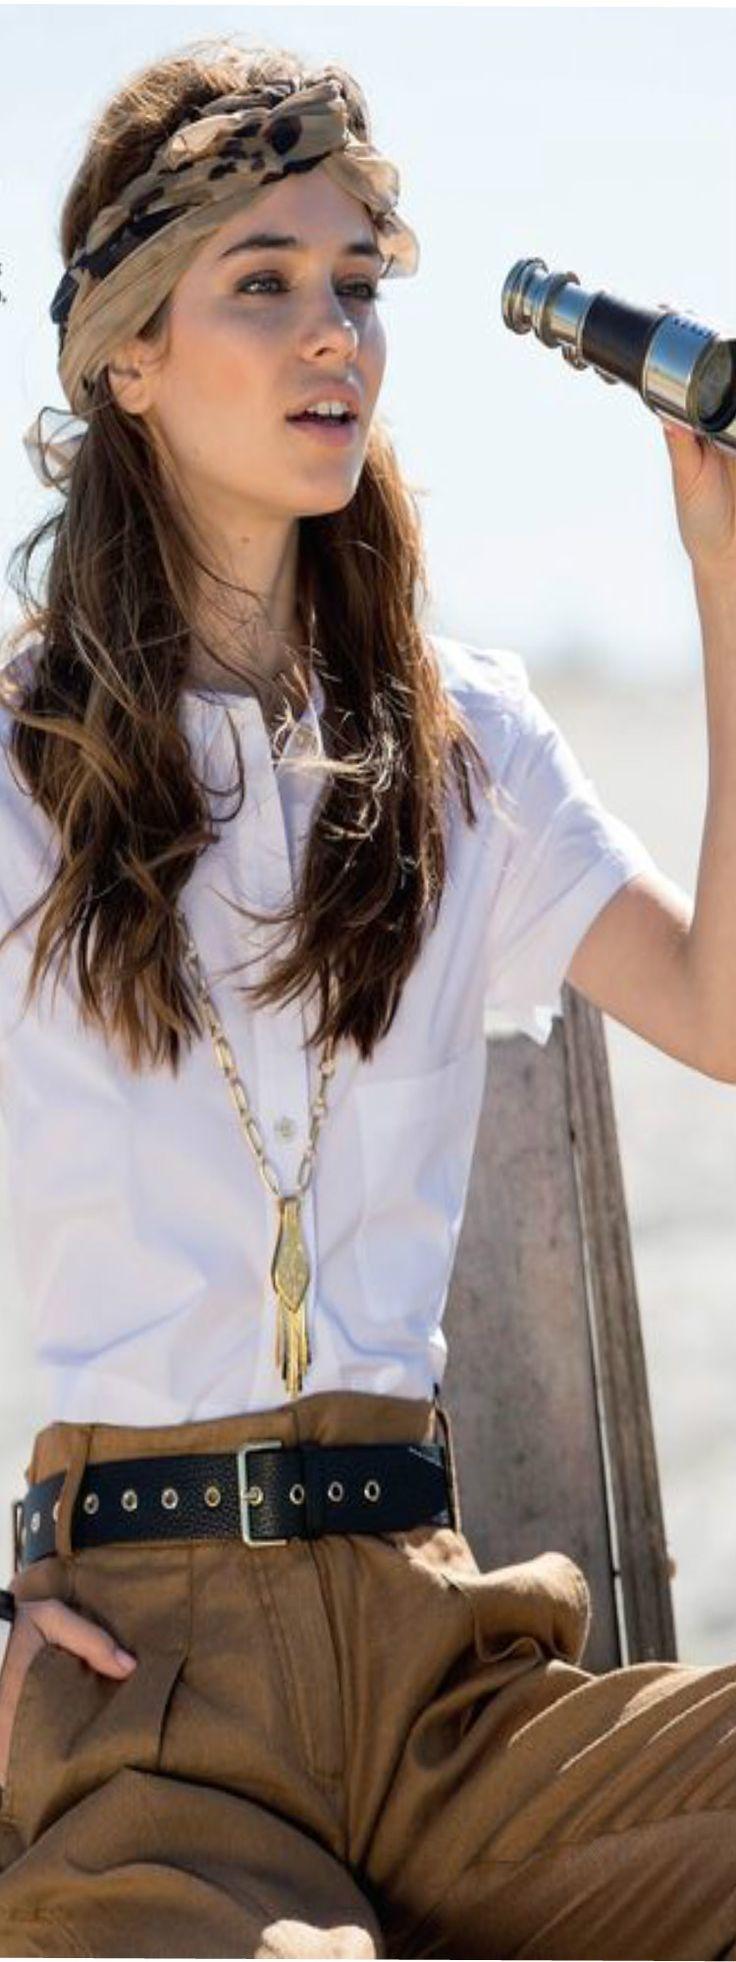 Safari Chic - Best 25+ Safari Chic Ideas On Pinterest Harem Pants Outfit